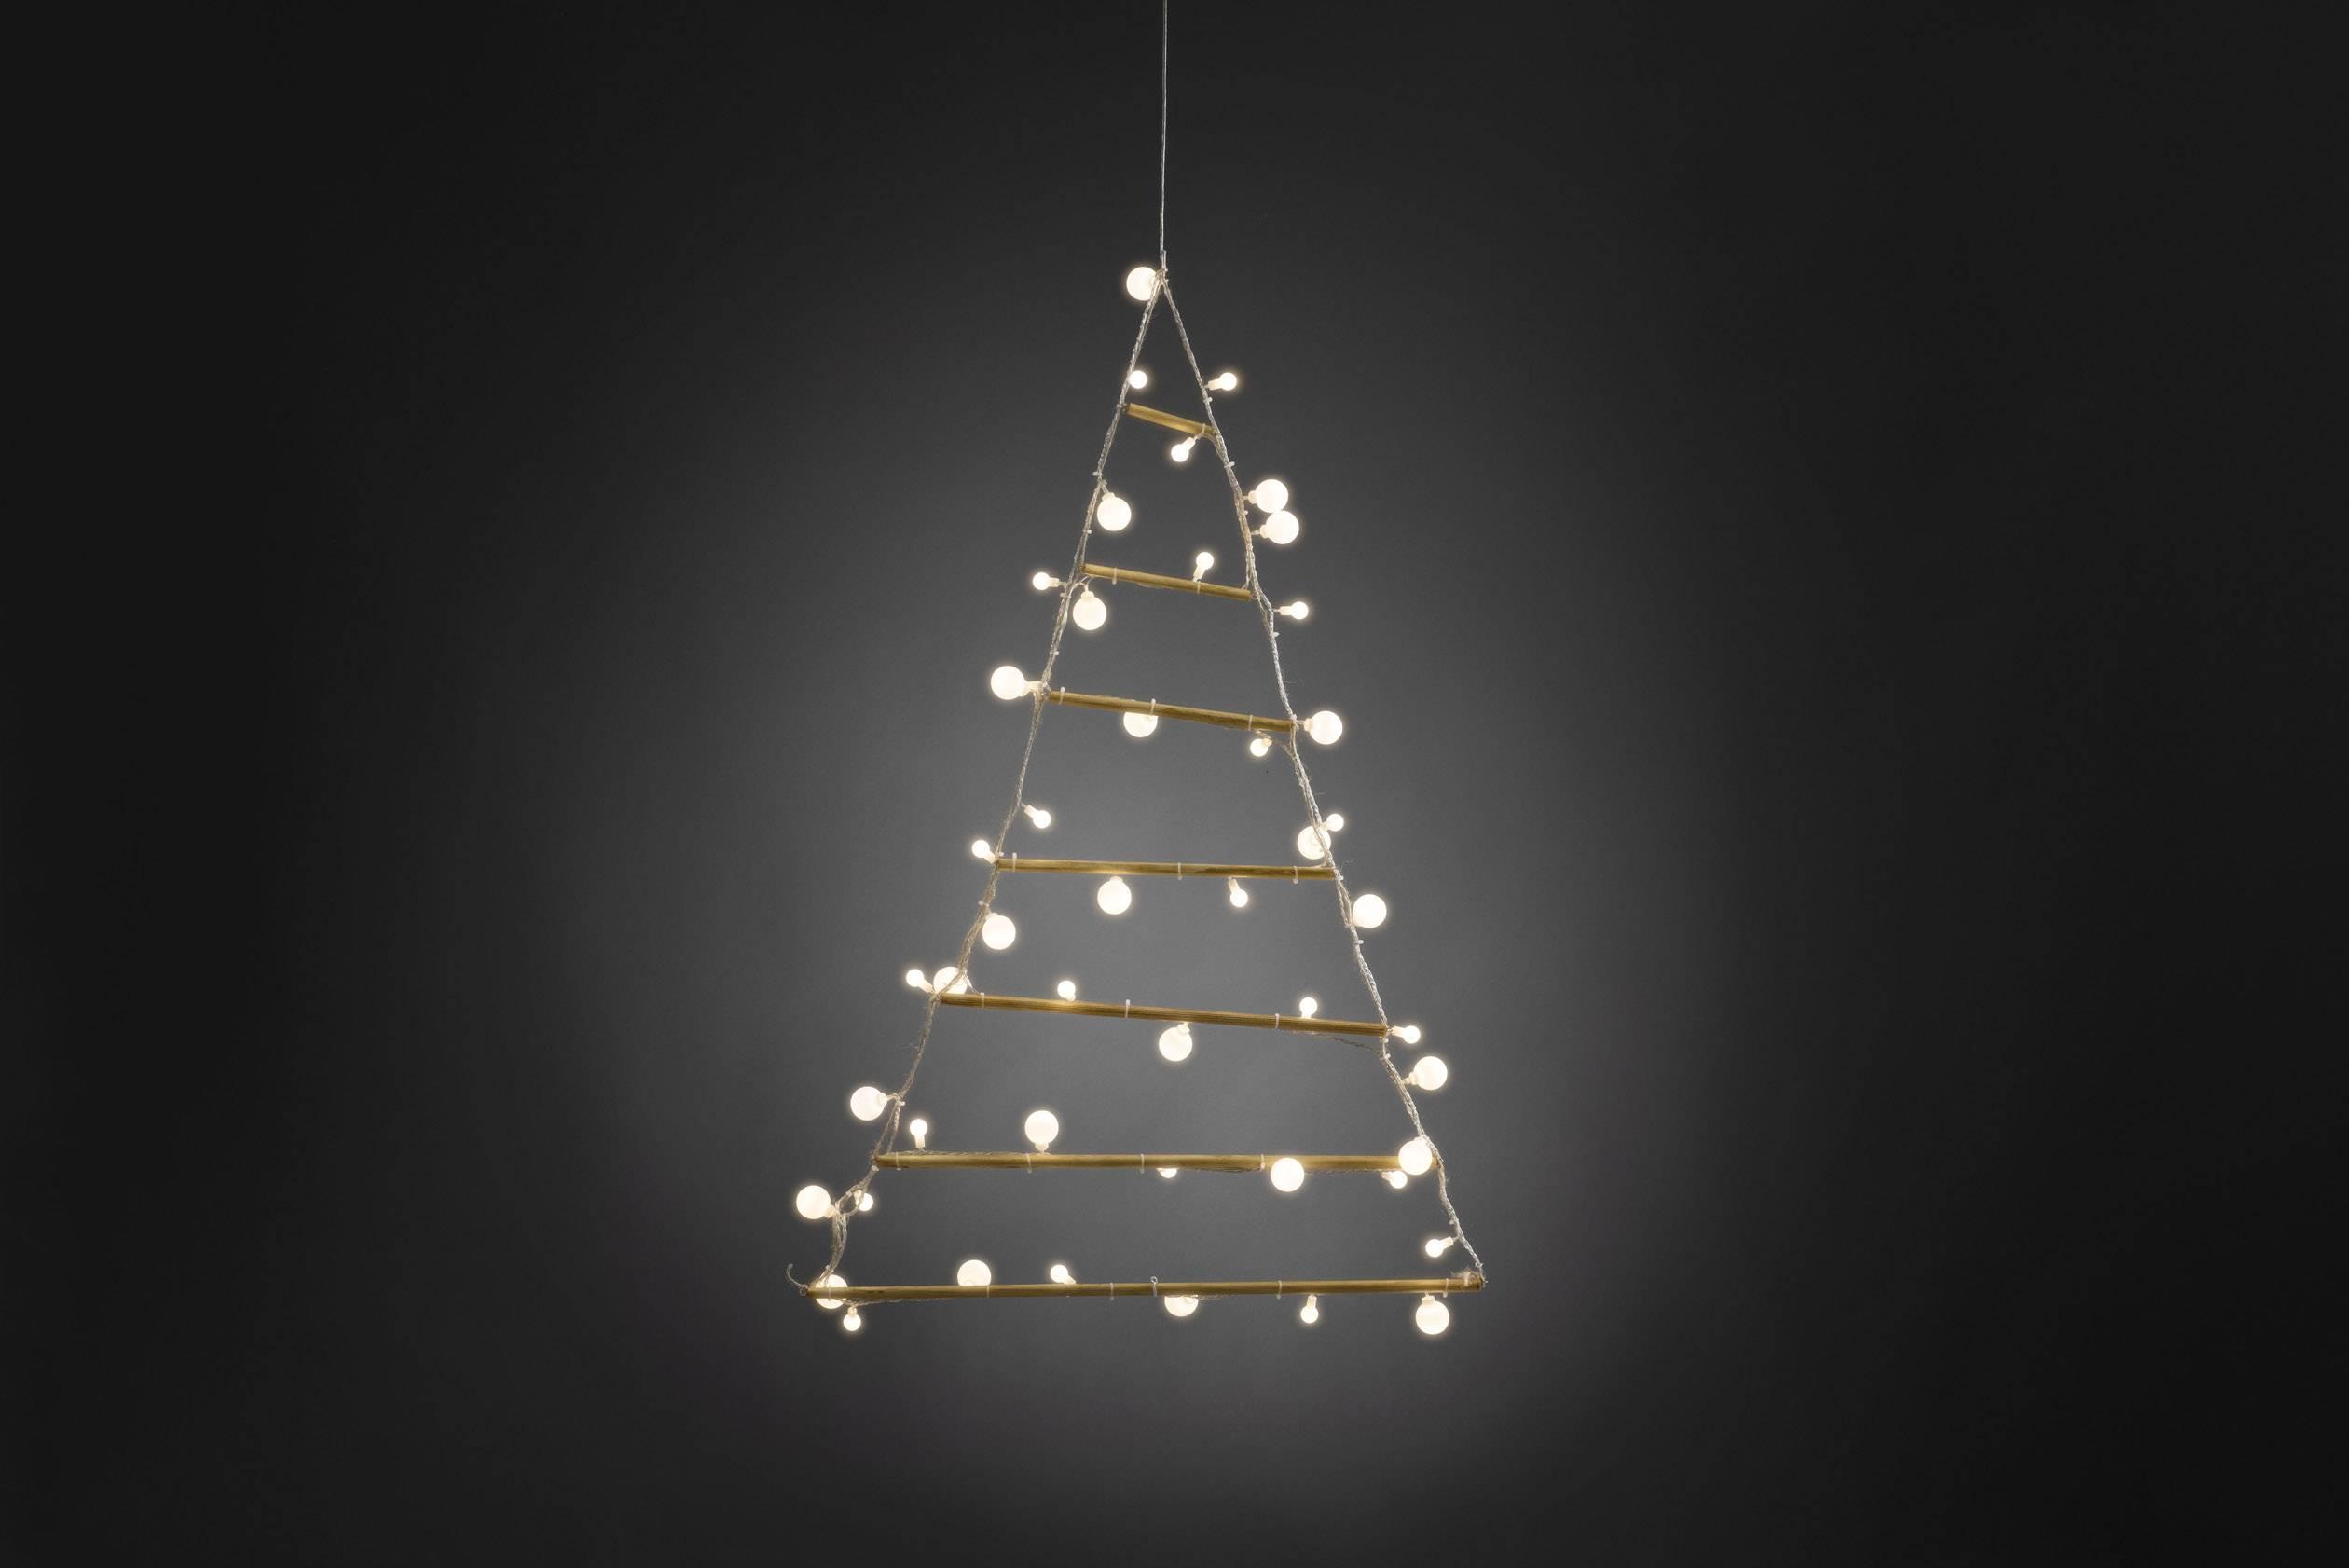 Zwart Wit Kerstdecoraties : Konstsmide 2887 103 led kerstdecoratie pyramide led conrad.be